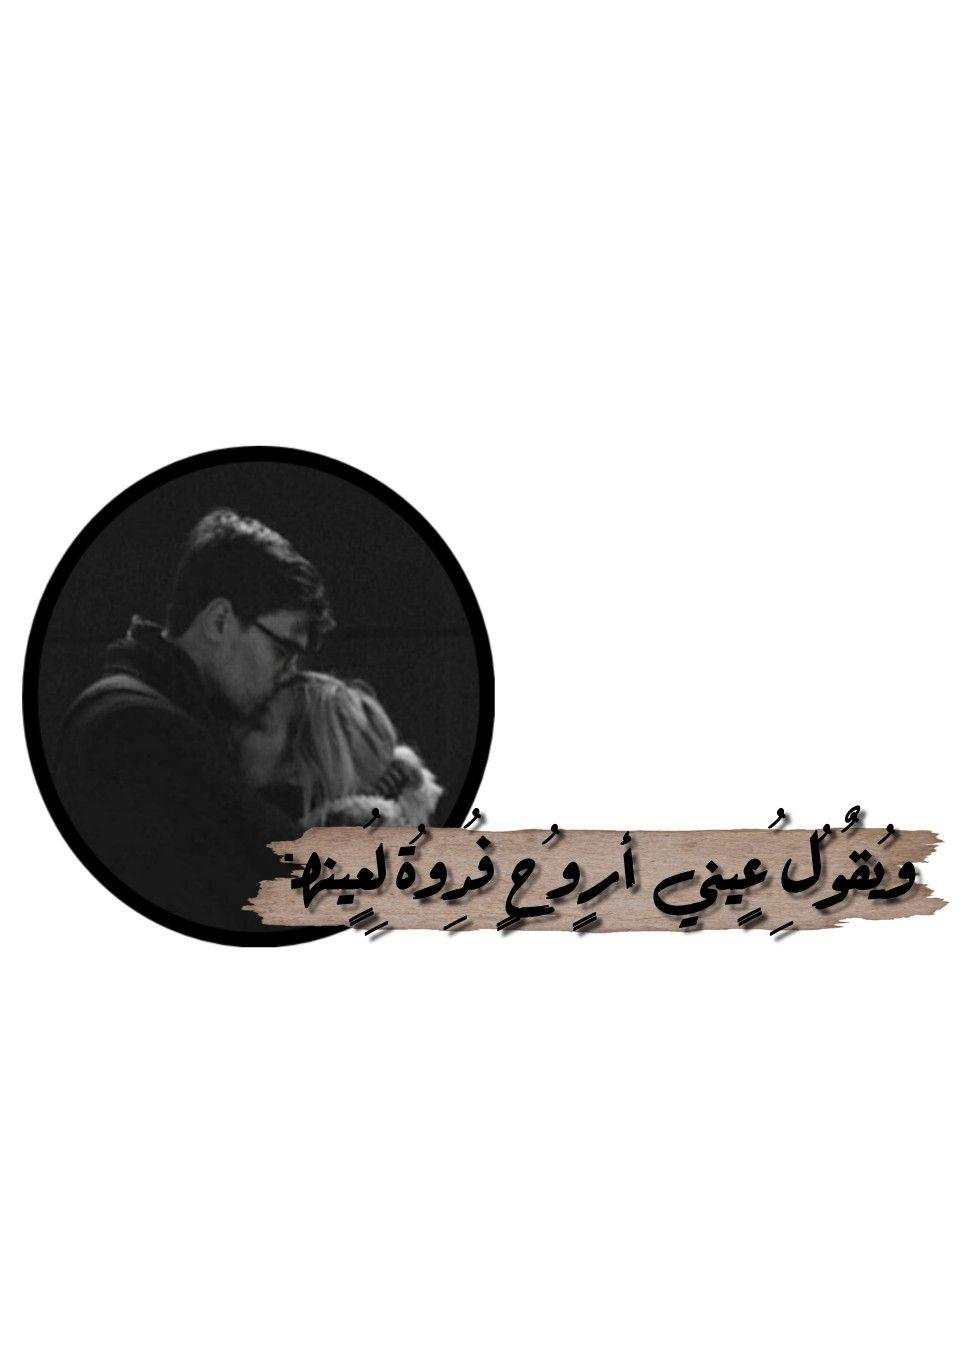 Pin By فتآة آبريل On تره حلاة الحلوه من ترفع الحاجب In 2020 Islamic Love Quotes Poster Movie Posters